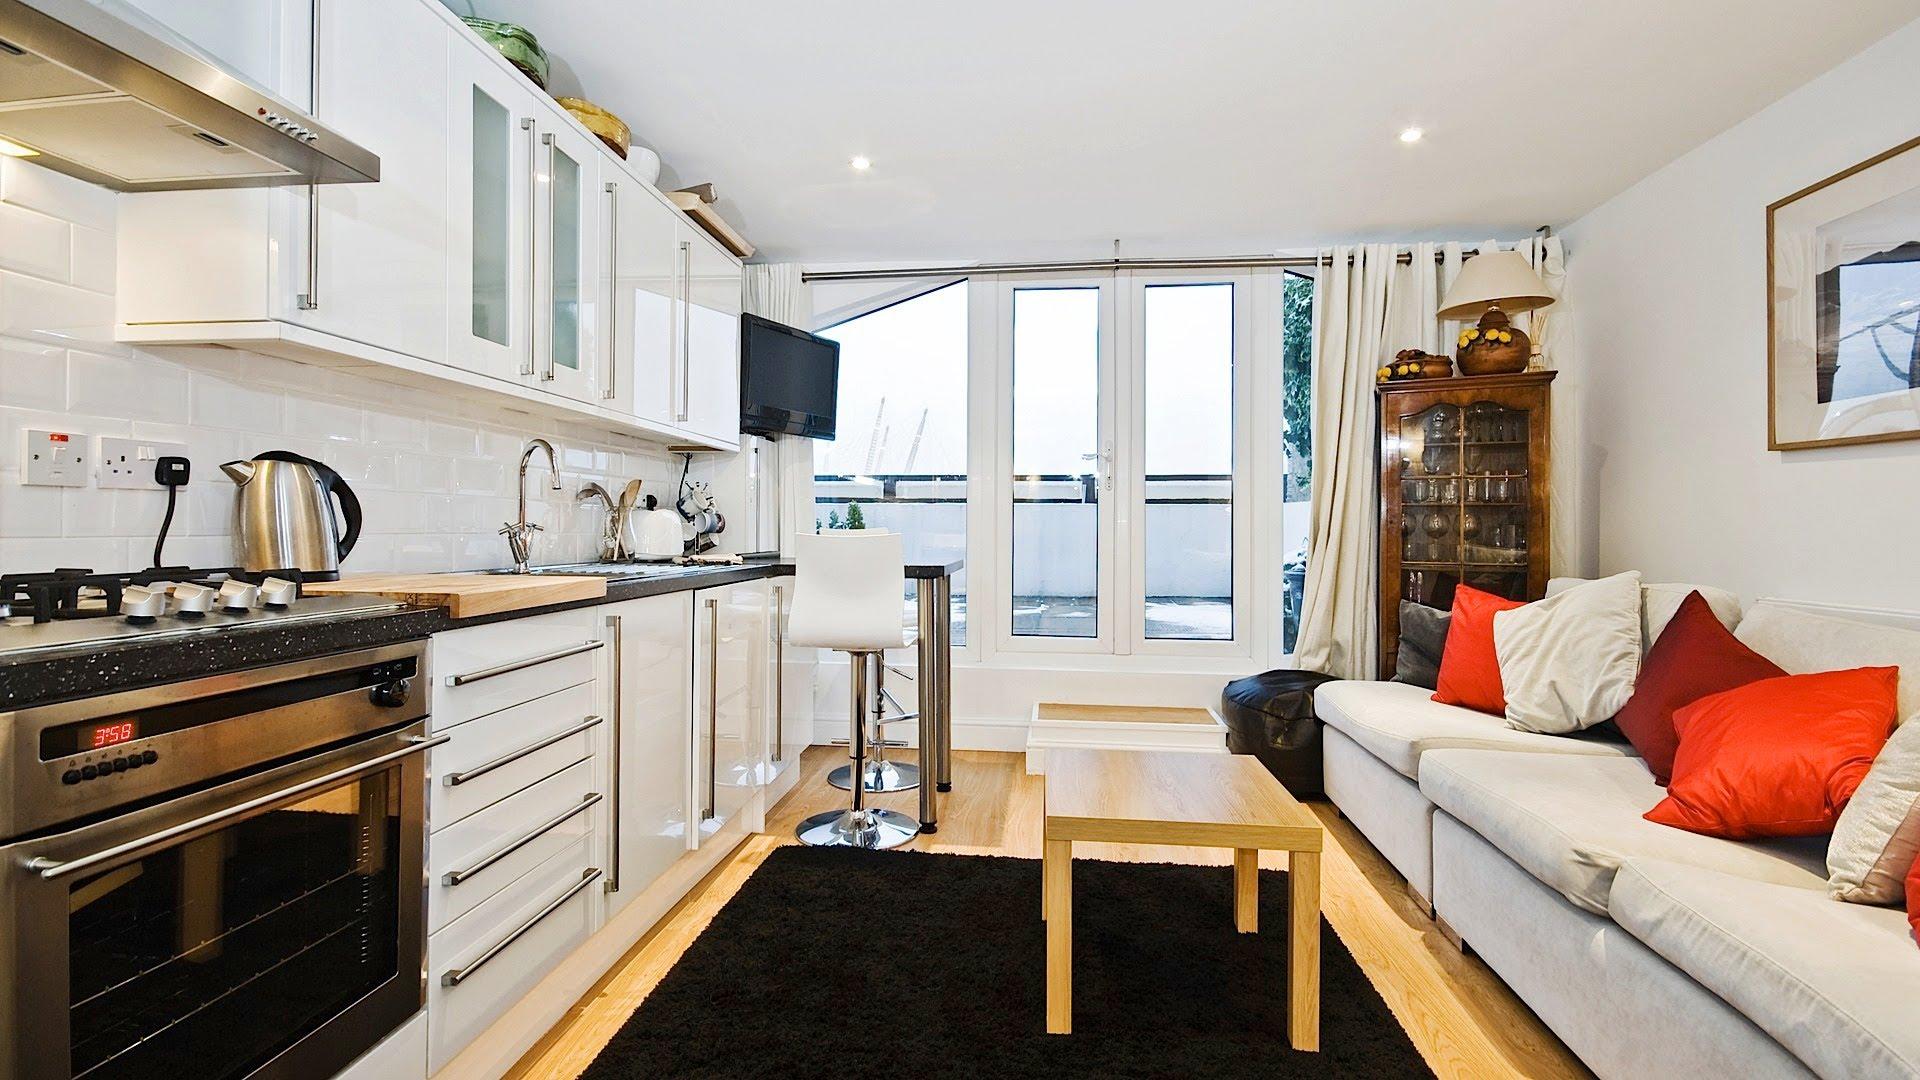 Space-Efficient Studio Apartment Furniture Ideas for Your ...